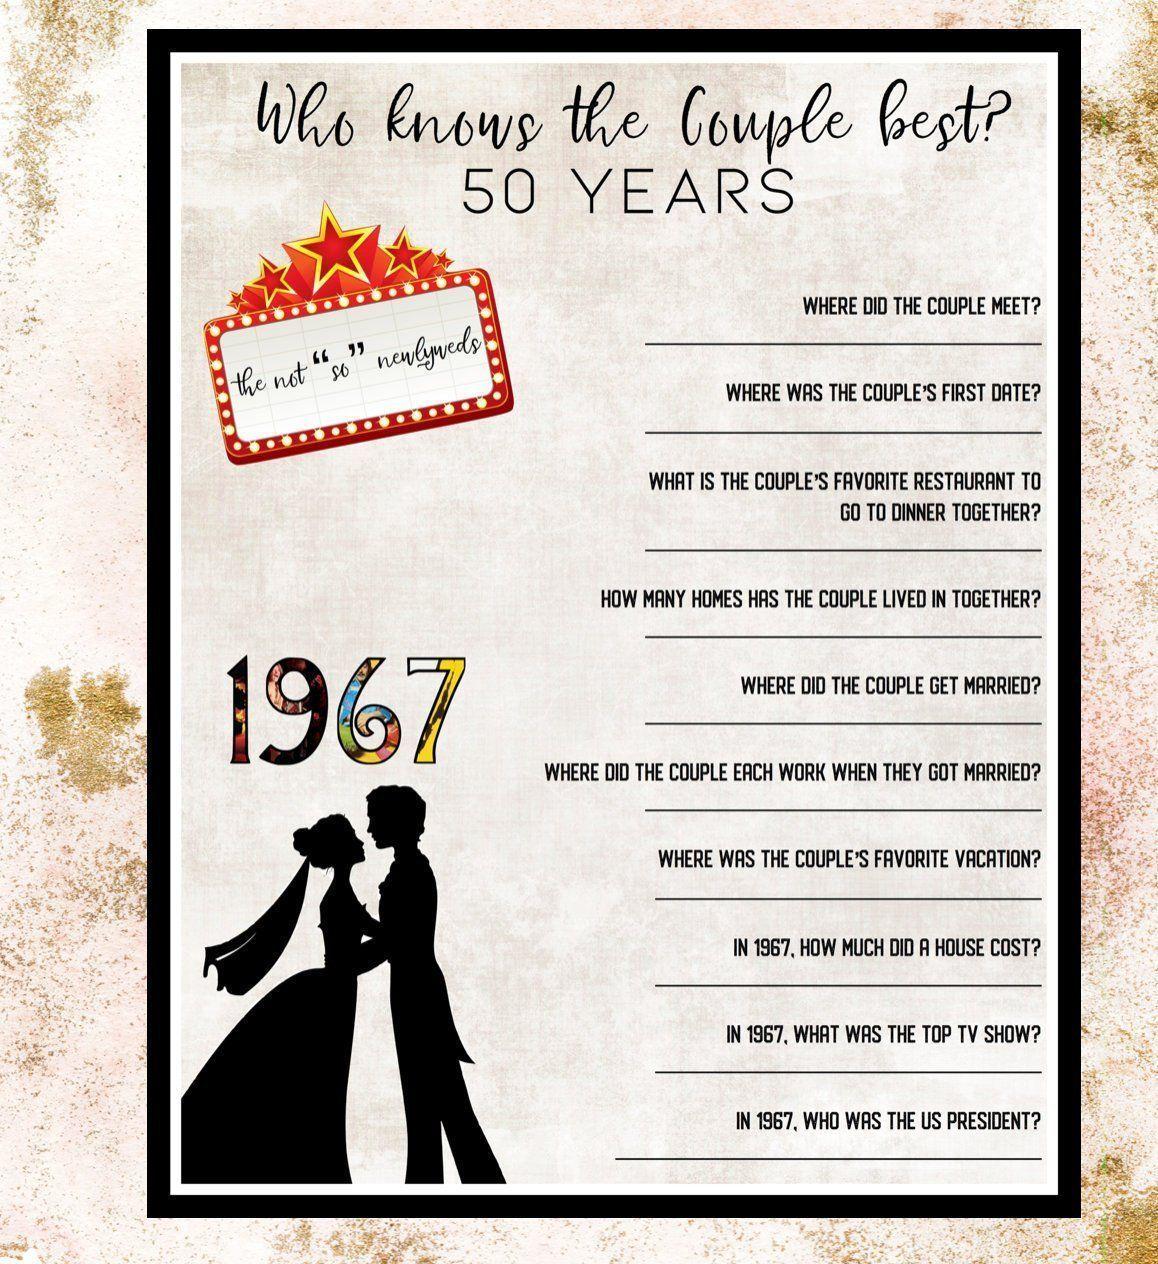 50th Wedding Anniversary Trivia Game in 2020 Anniversary